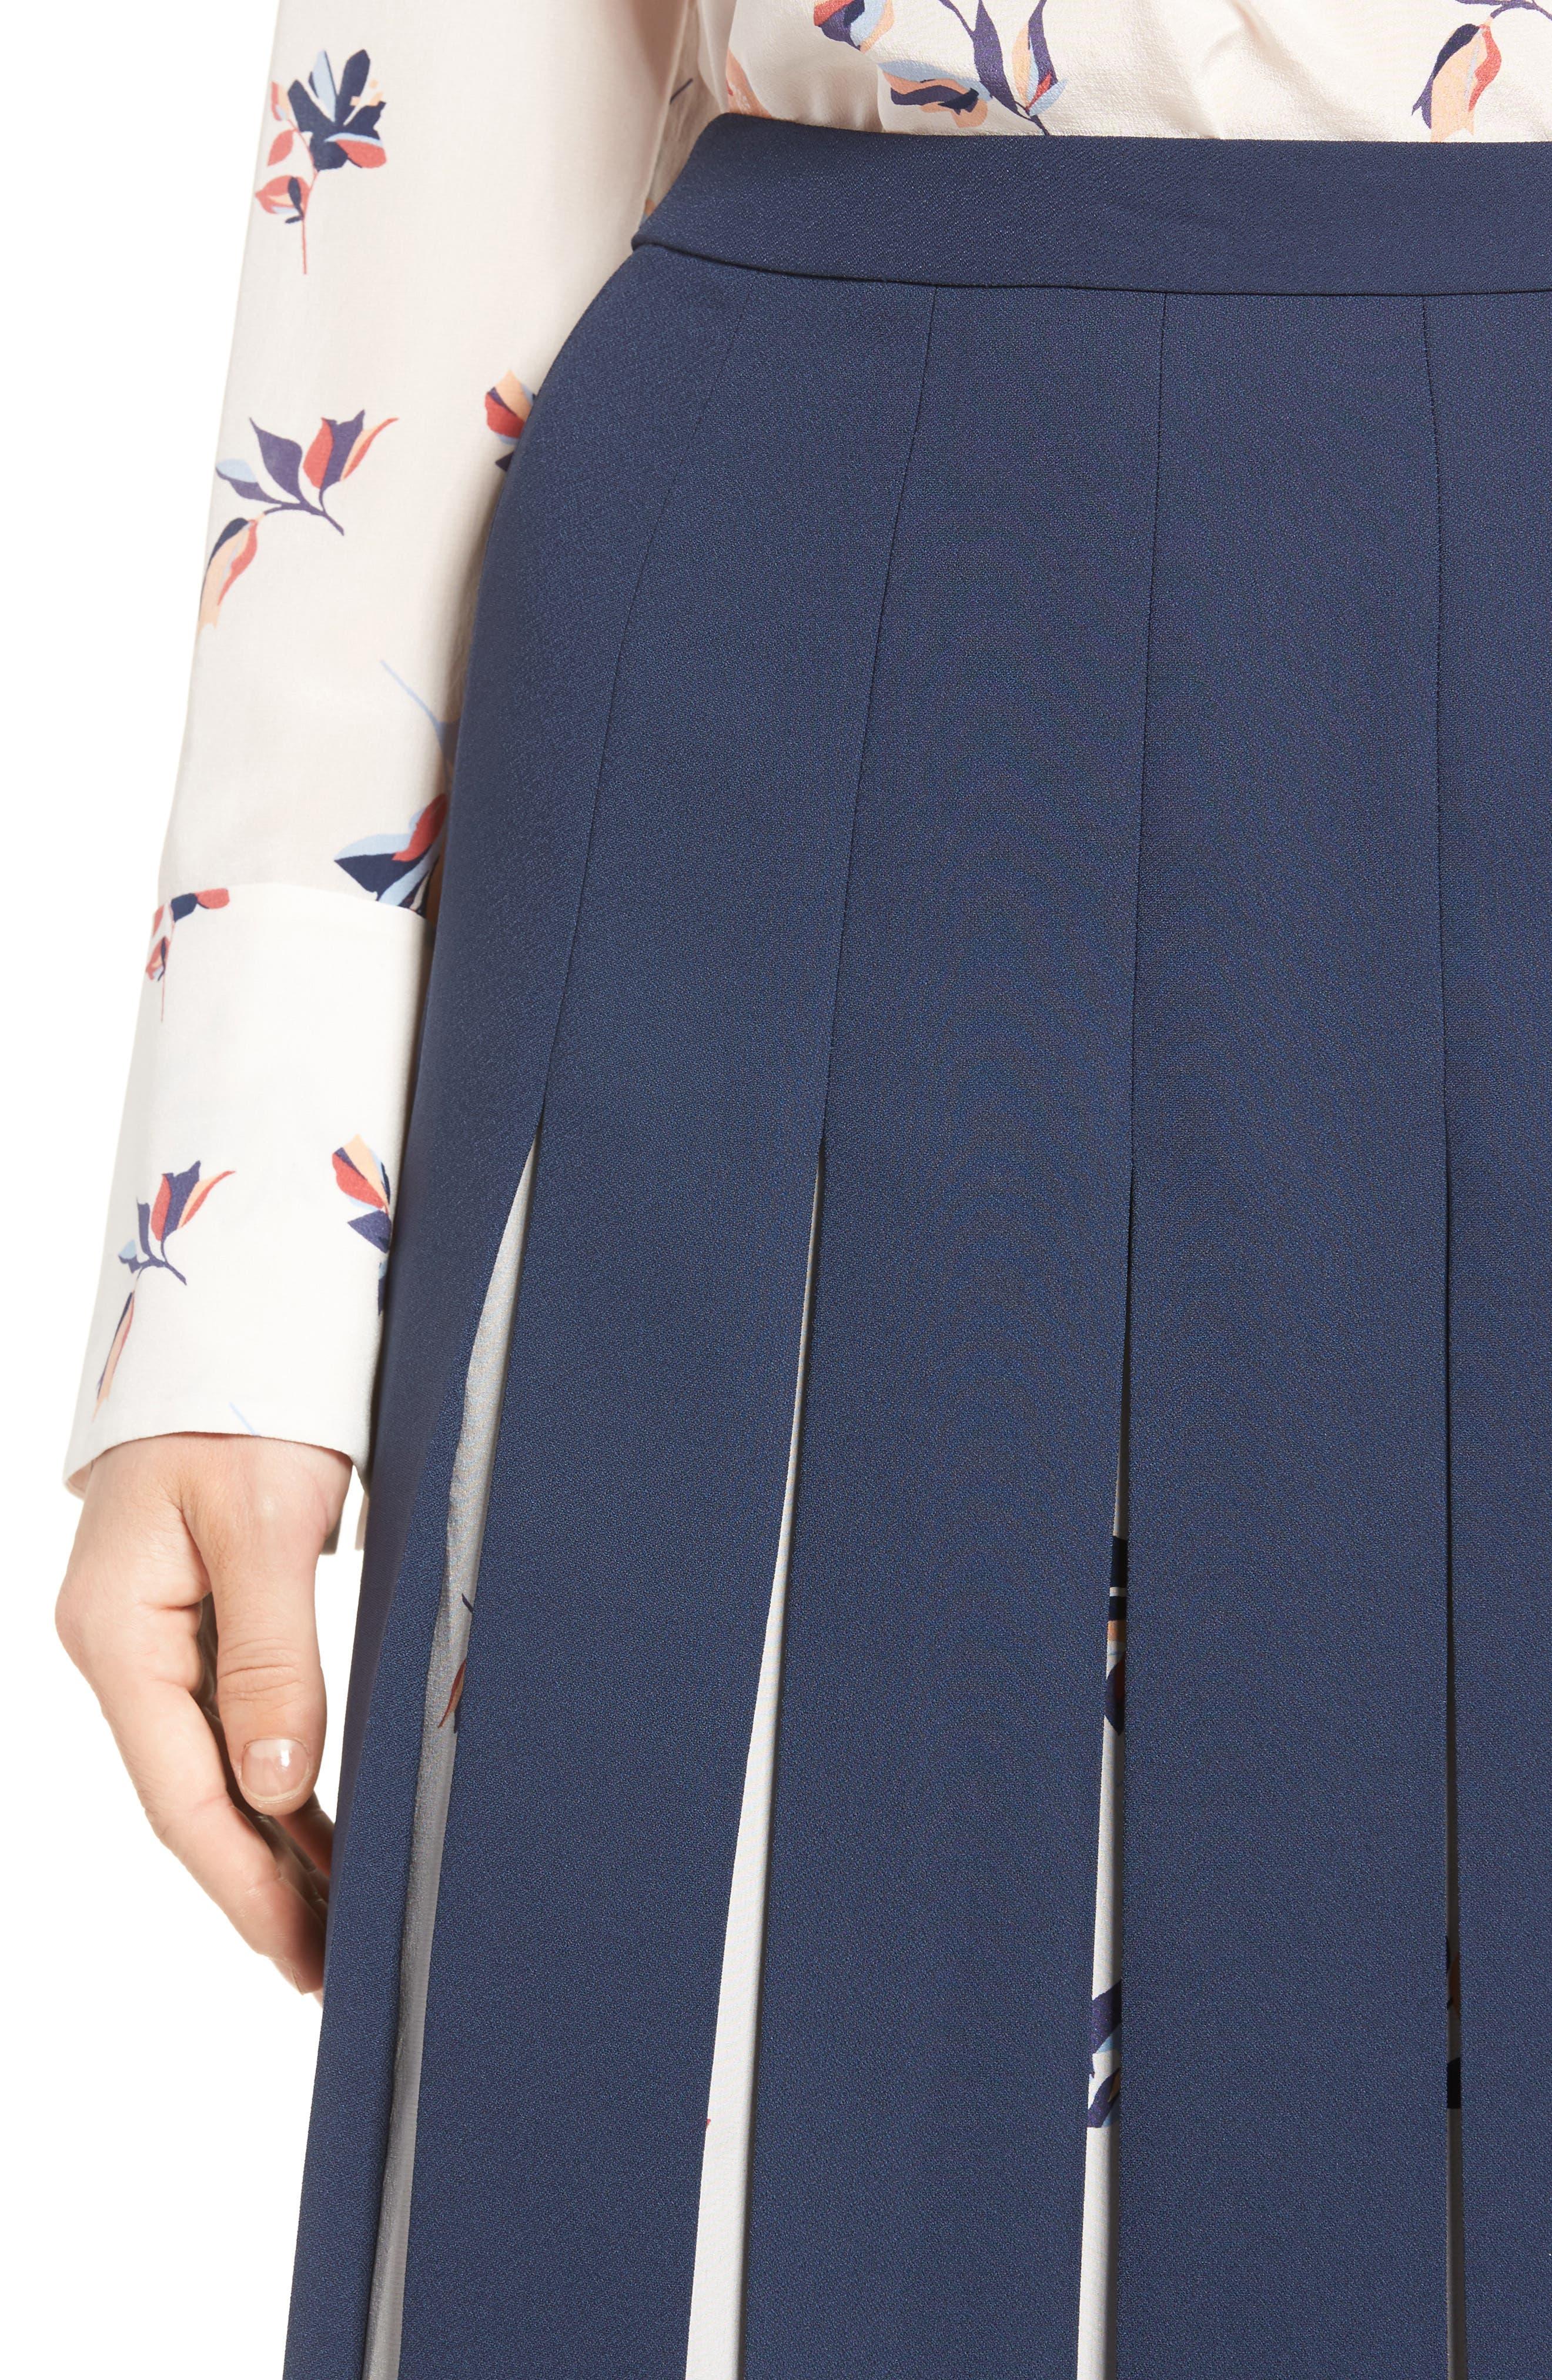 Print Mix Pleated Skirt,                             Alternate thumbnail 4, color,                             410